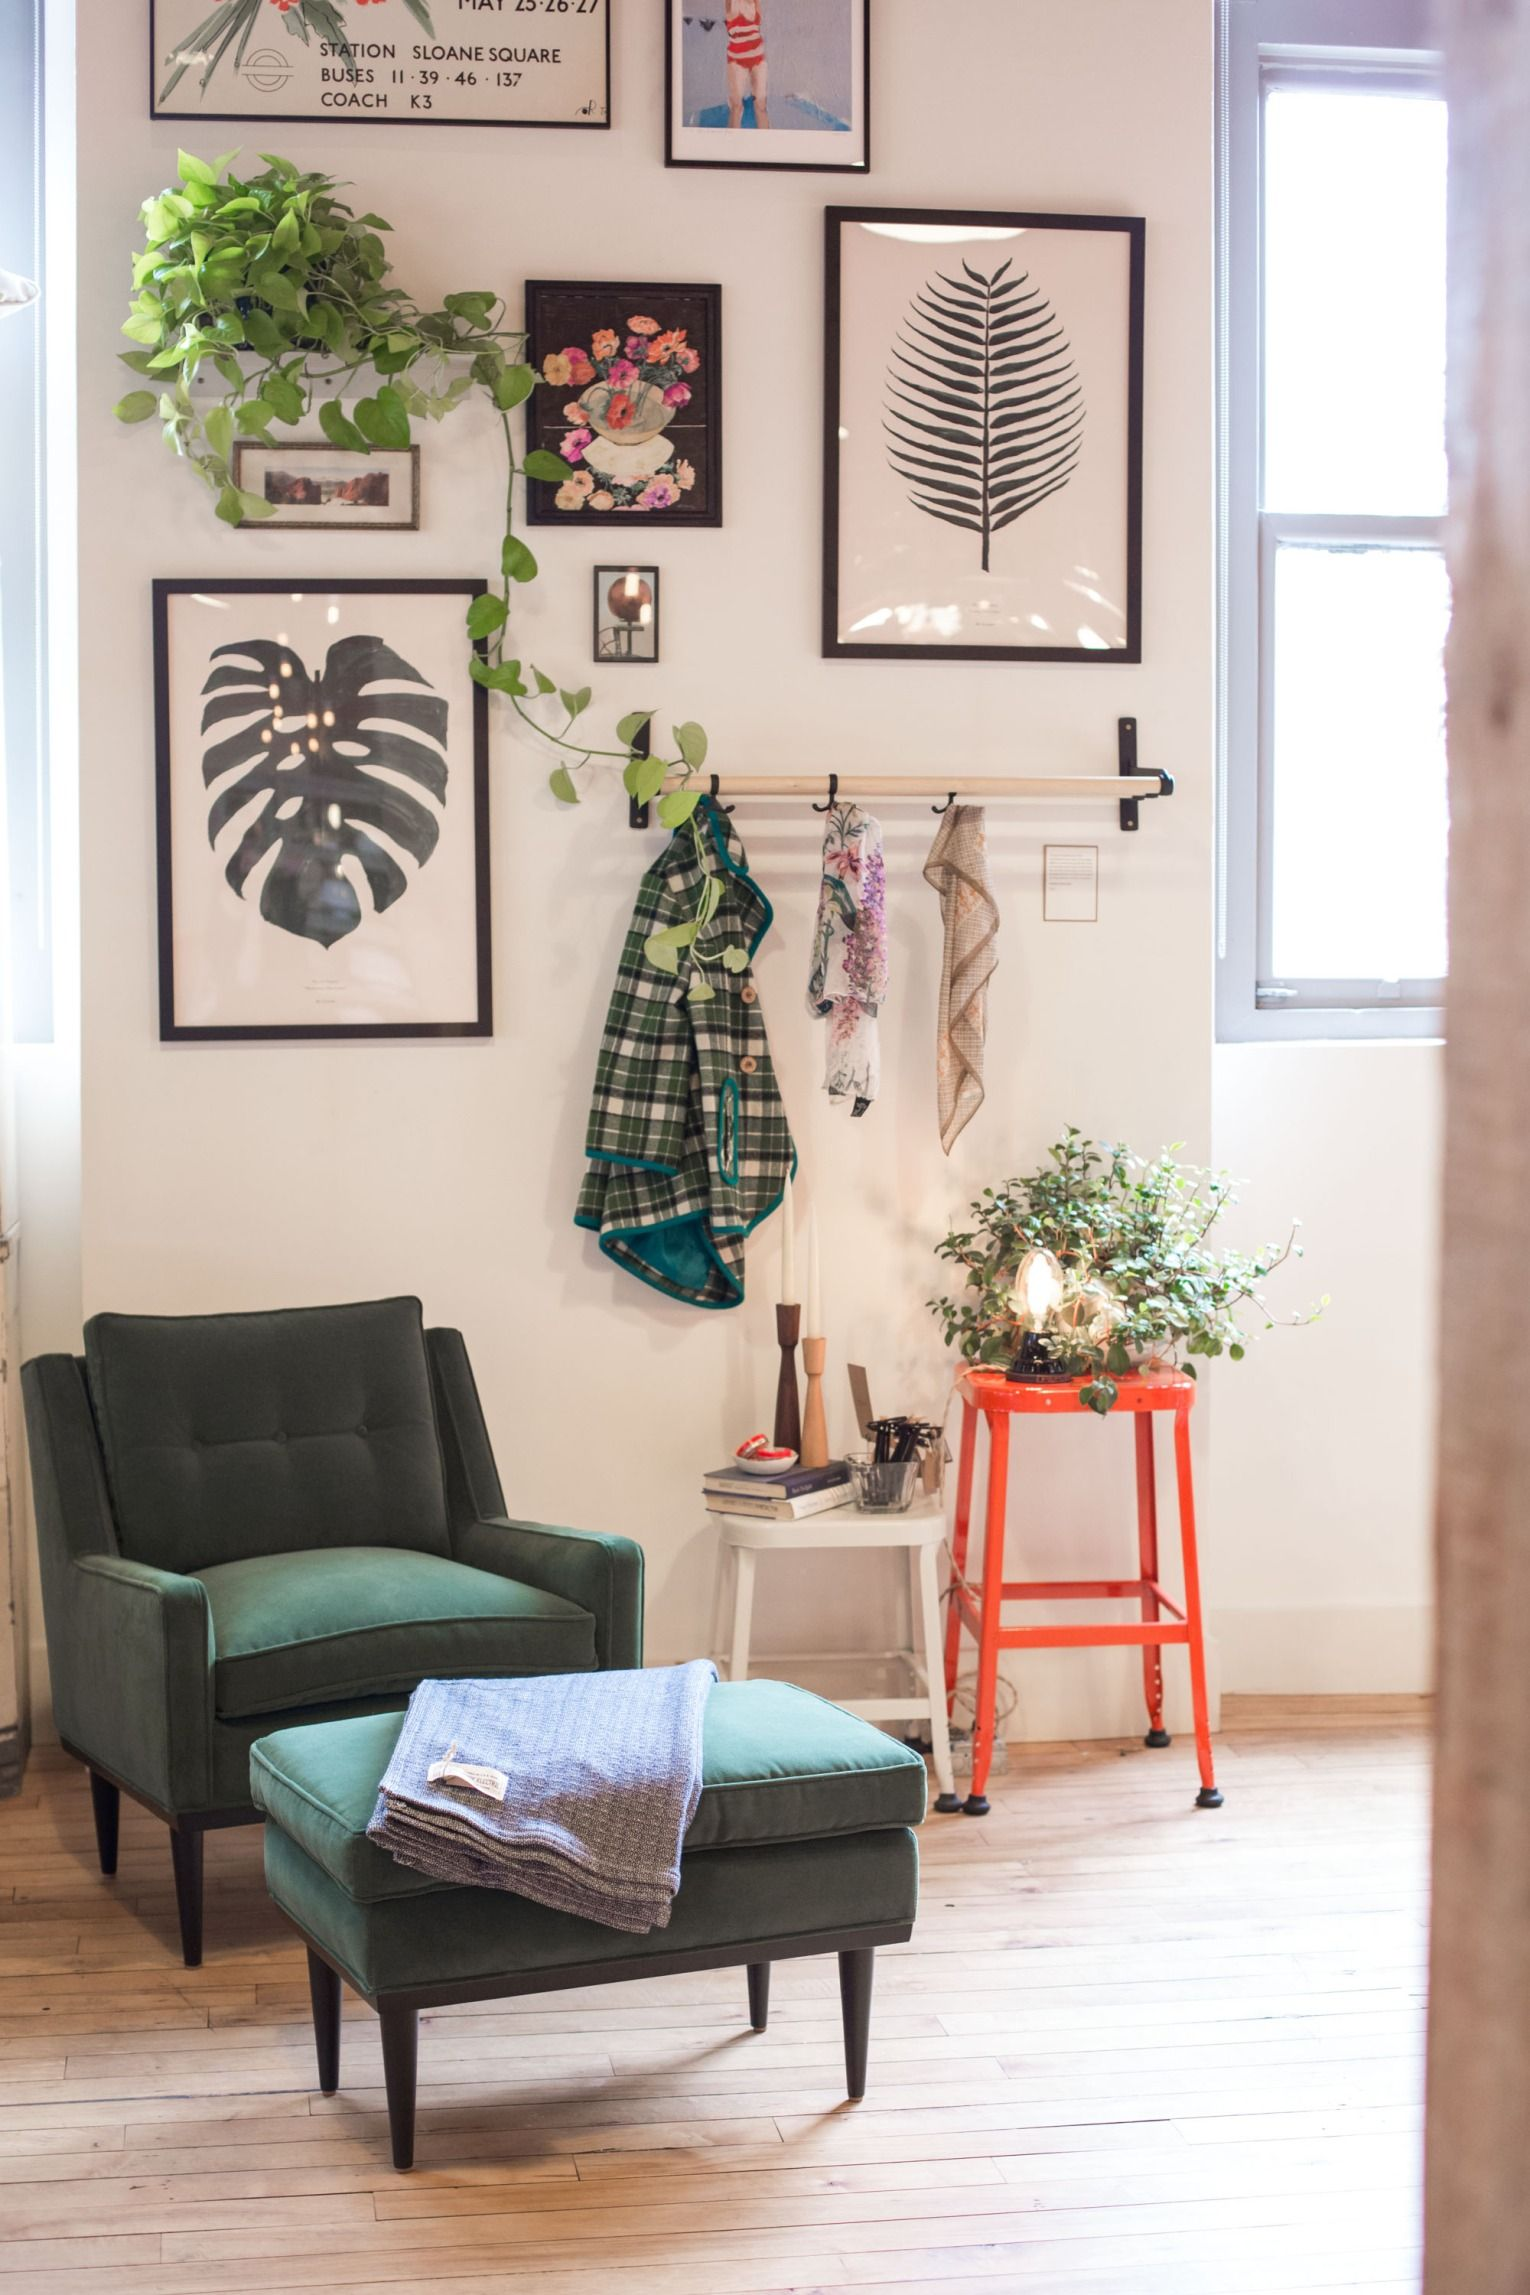 Period Modern Lighting Furniture Hardware Home Decor Bedroom Home Decor Home Decor Inspiration